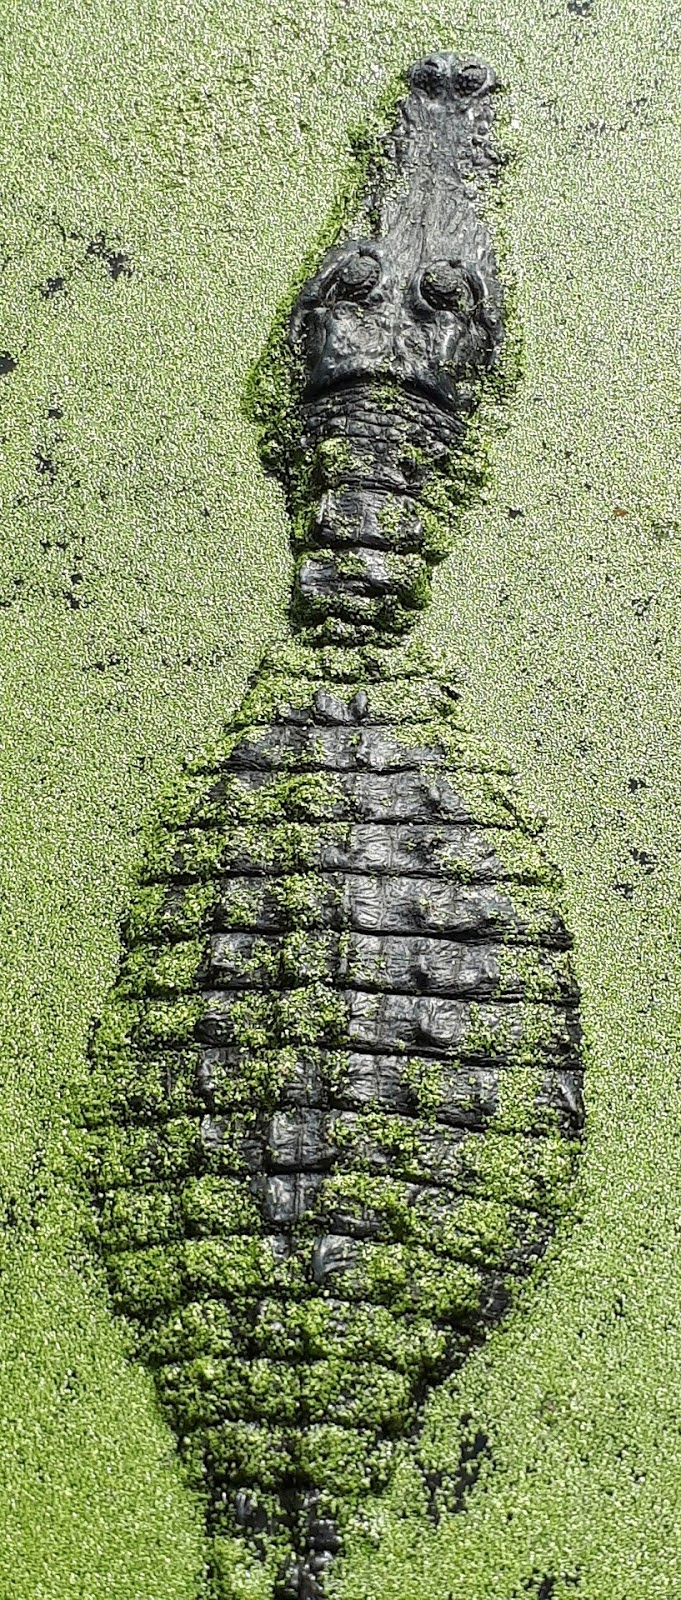 A well-camouflaged crocodile.